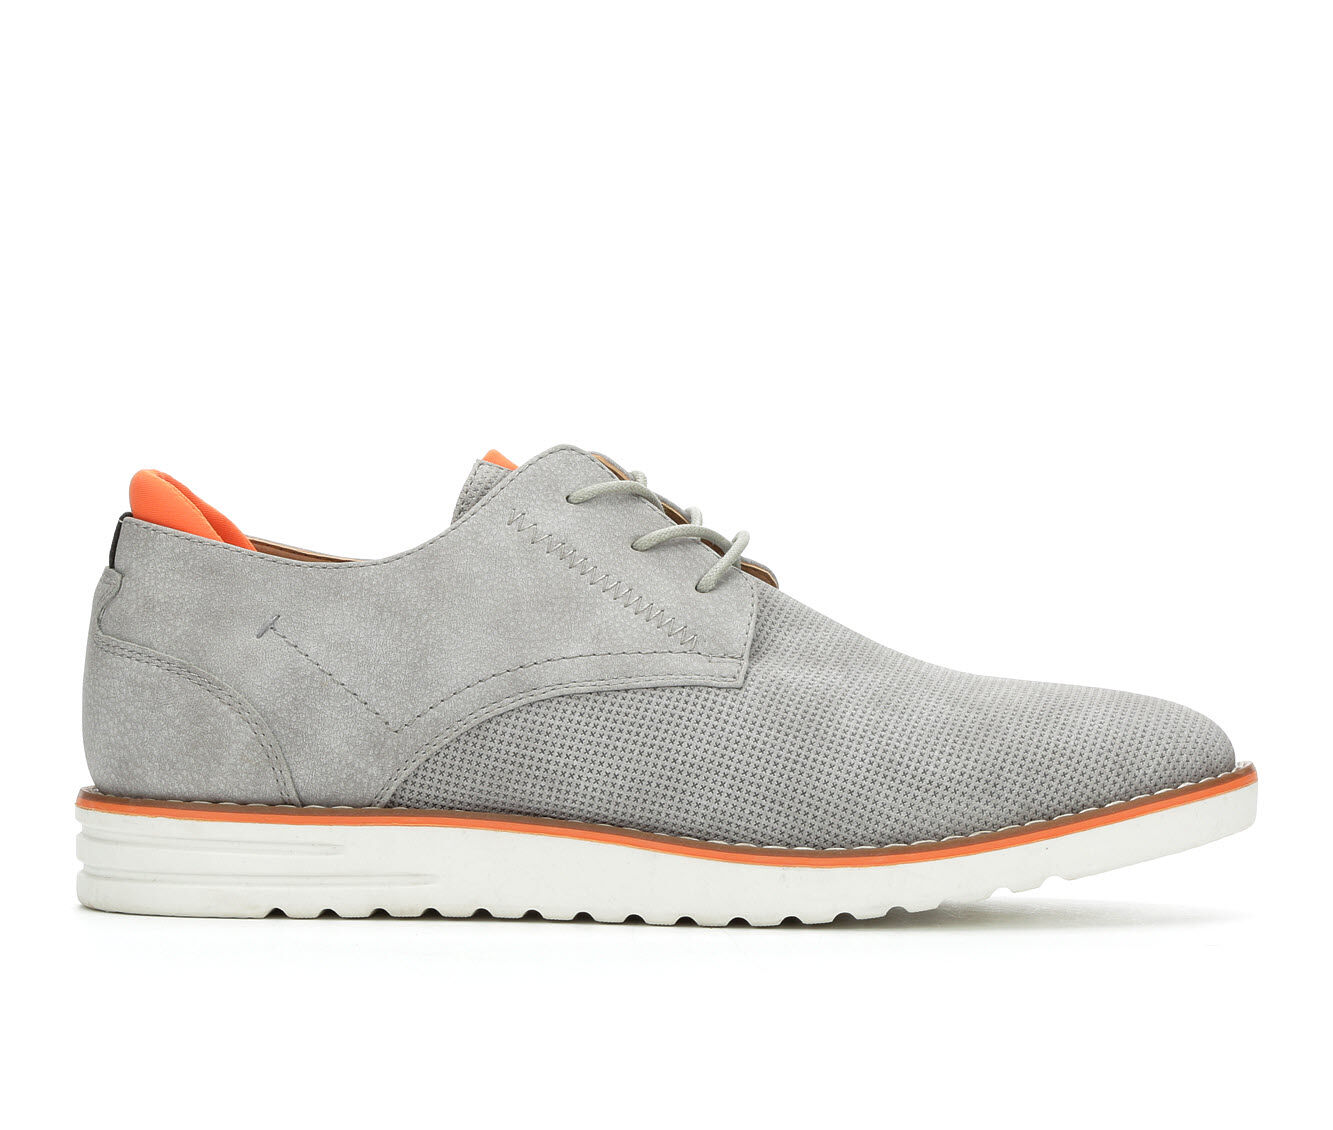 cheap wholesale Men's Madden Calen Dress Shoes Grey/Orange